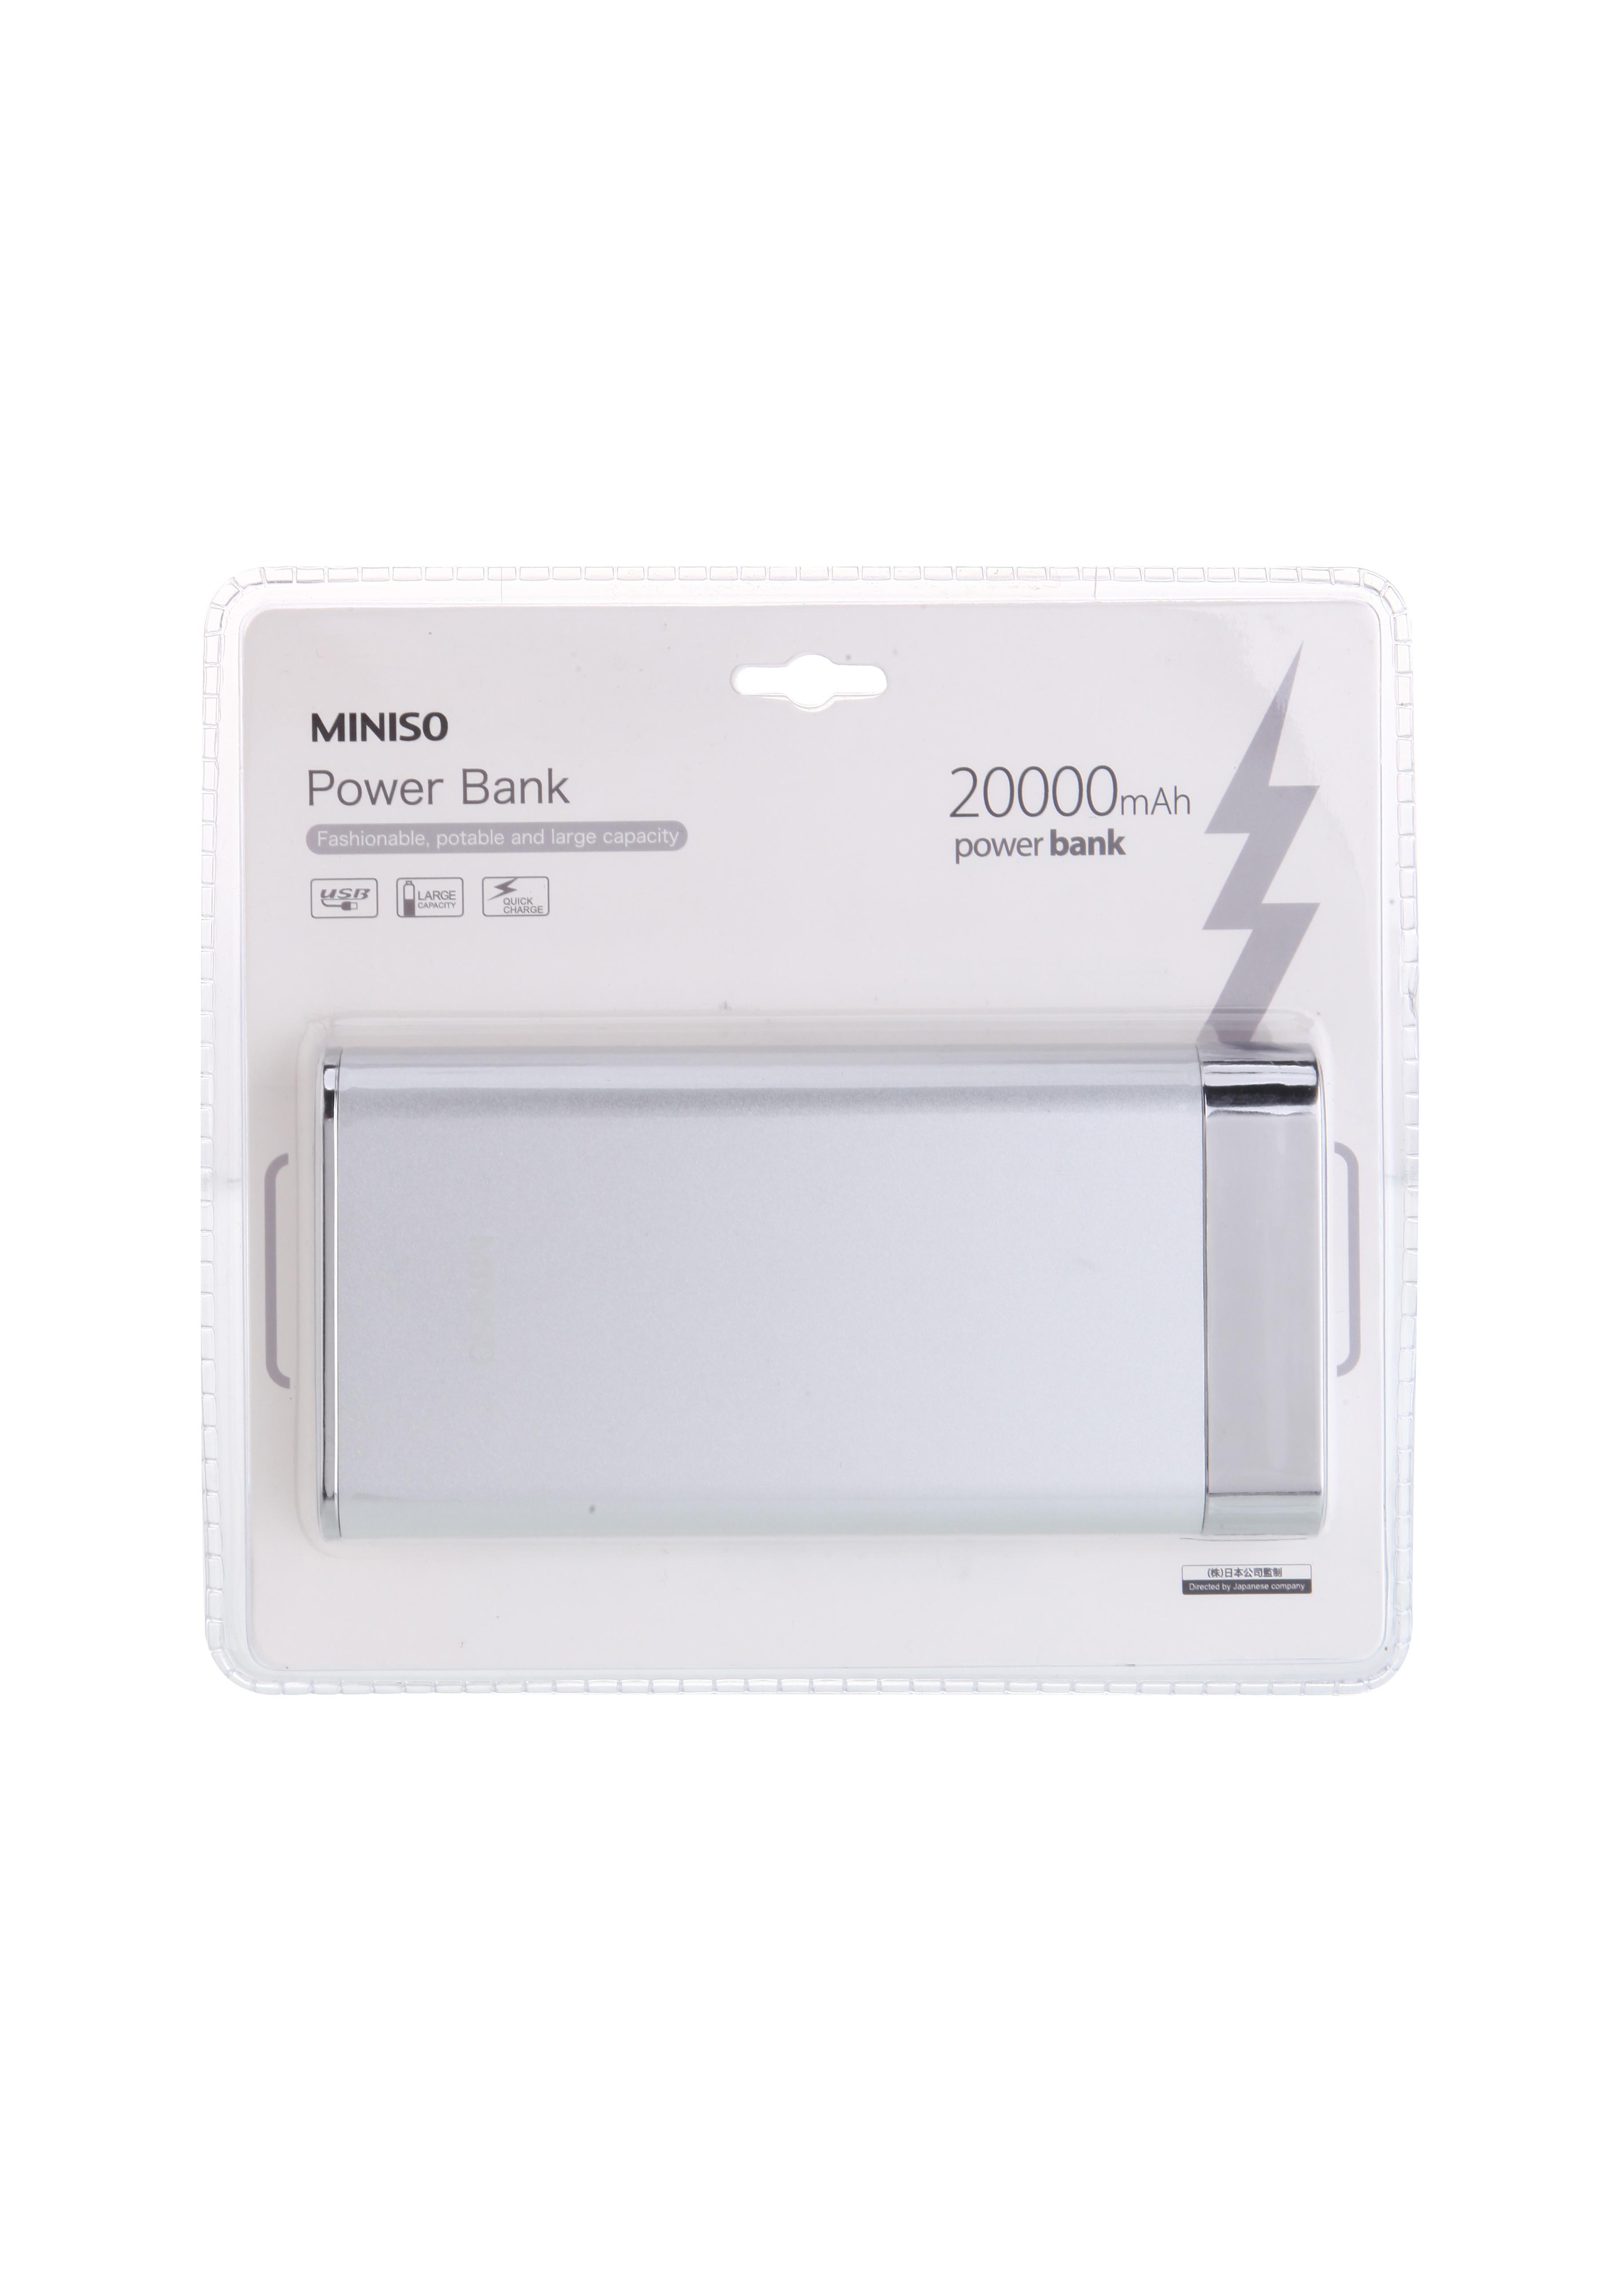 Power Bank 20000Mah Yz200 Plateado 16.7*7.2*2Cm